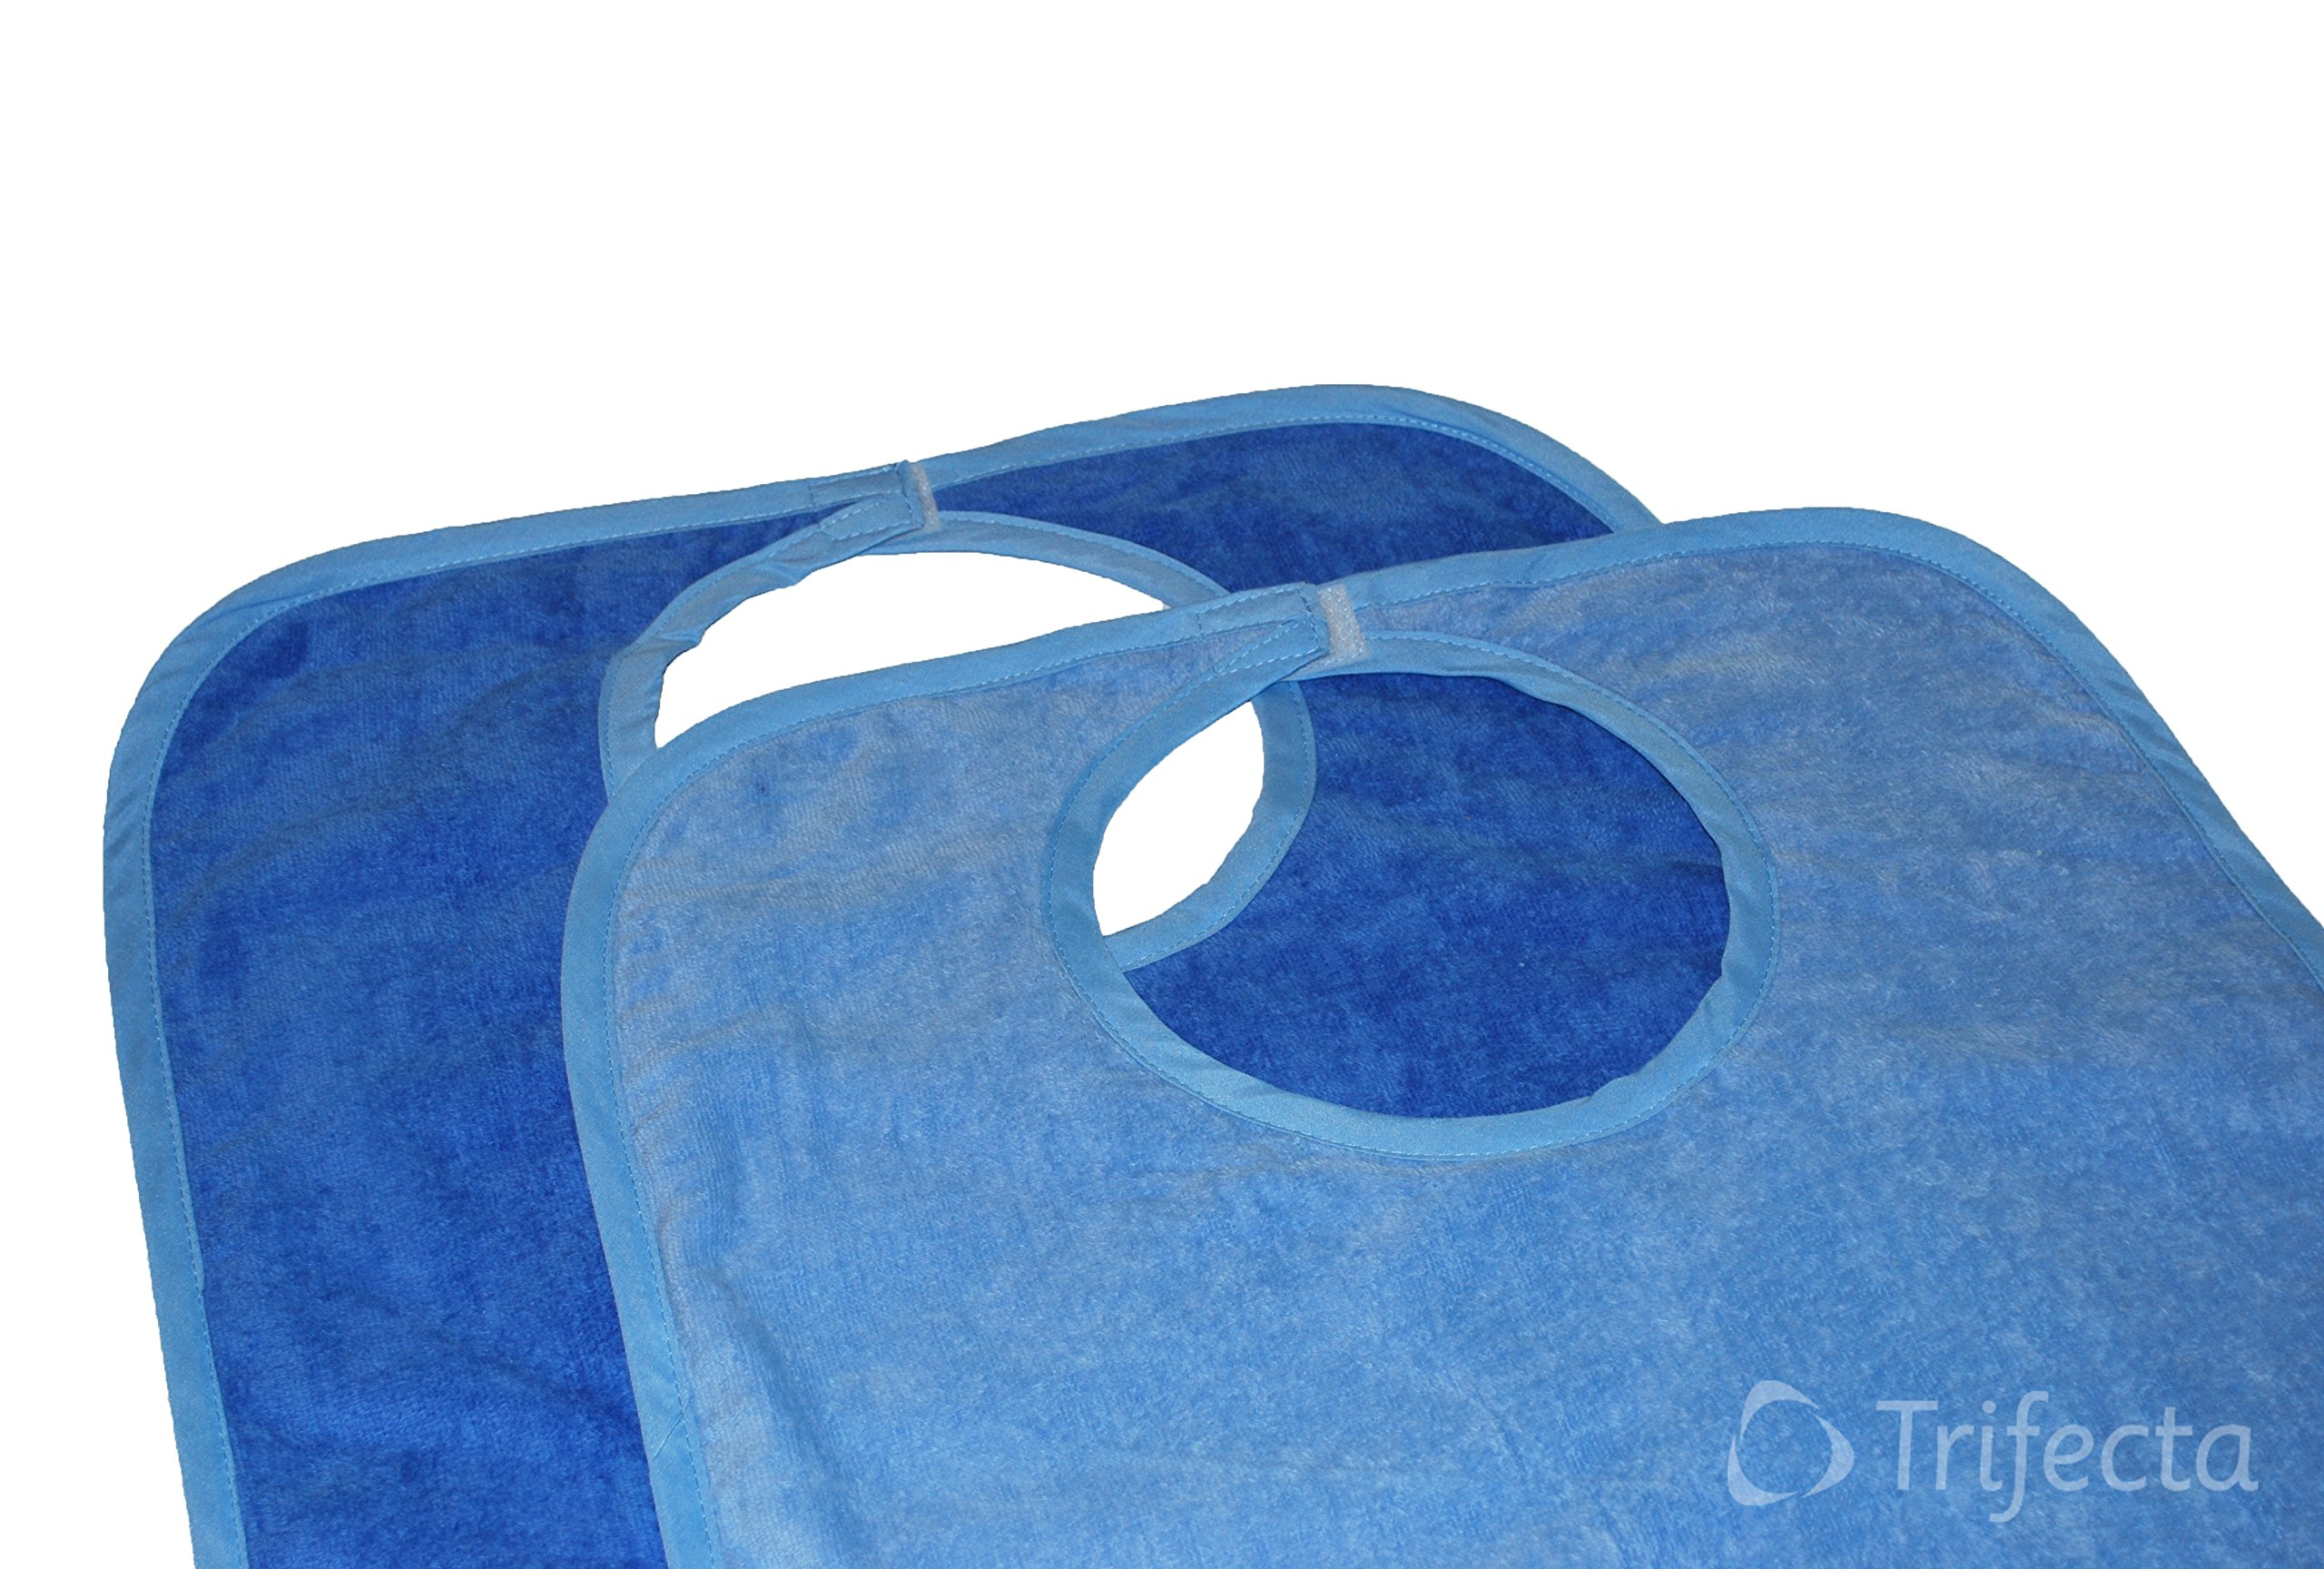 Cotton Terry Adult Bib - Reusable Machine Washable 18''x 36'' (Pk/2 Light/Dark)